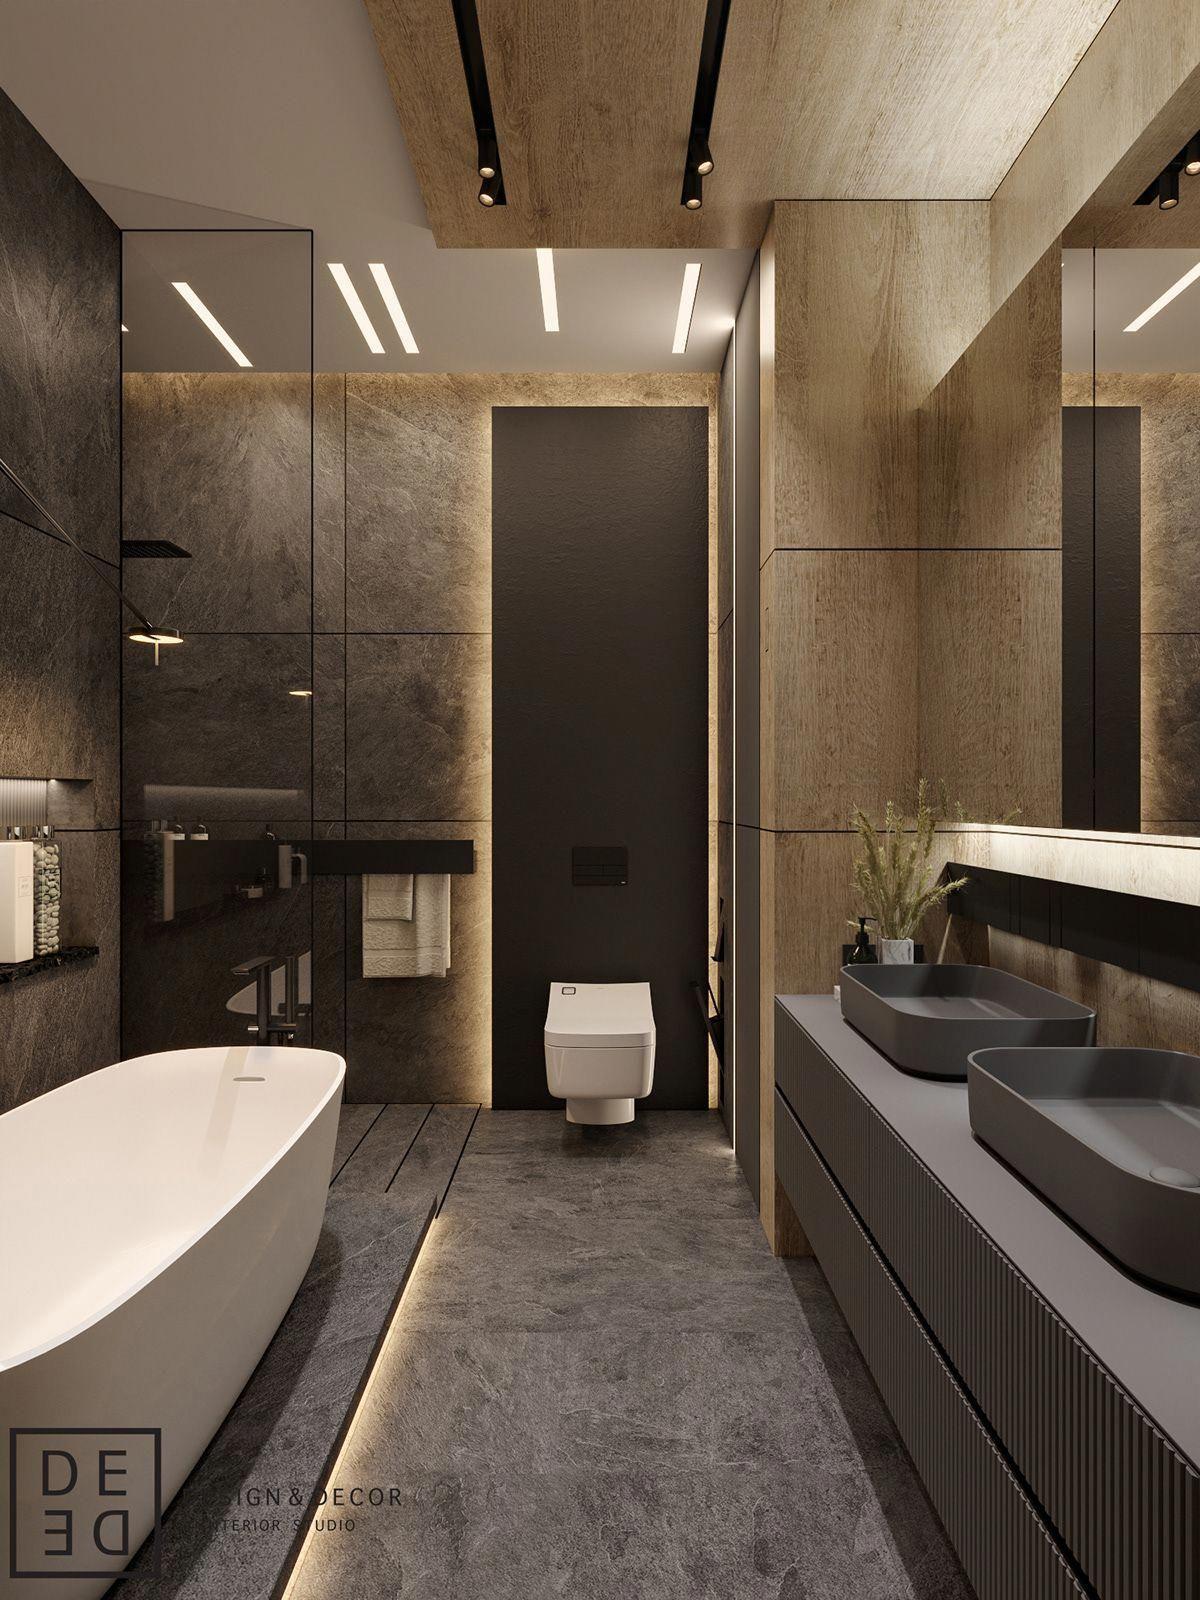 Affordable Luxury Bathroom Ideas Masterbathroomideas Bathroom Interior Design Modern Master Bathroom Dream Bathrooms